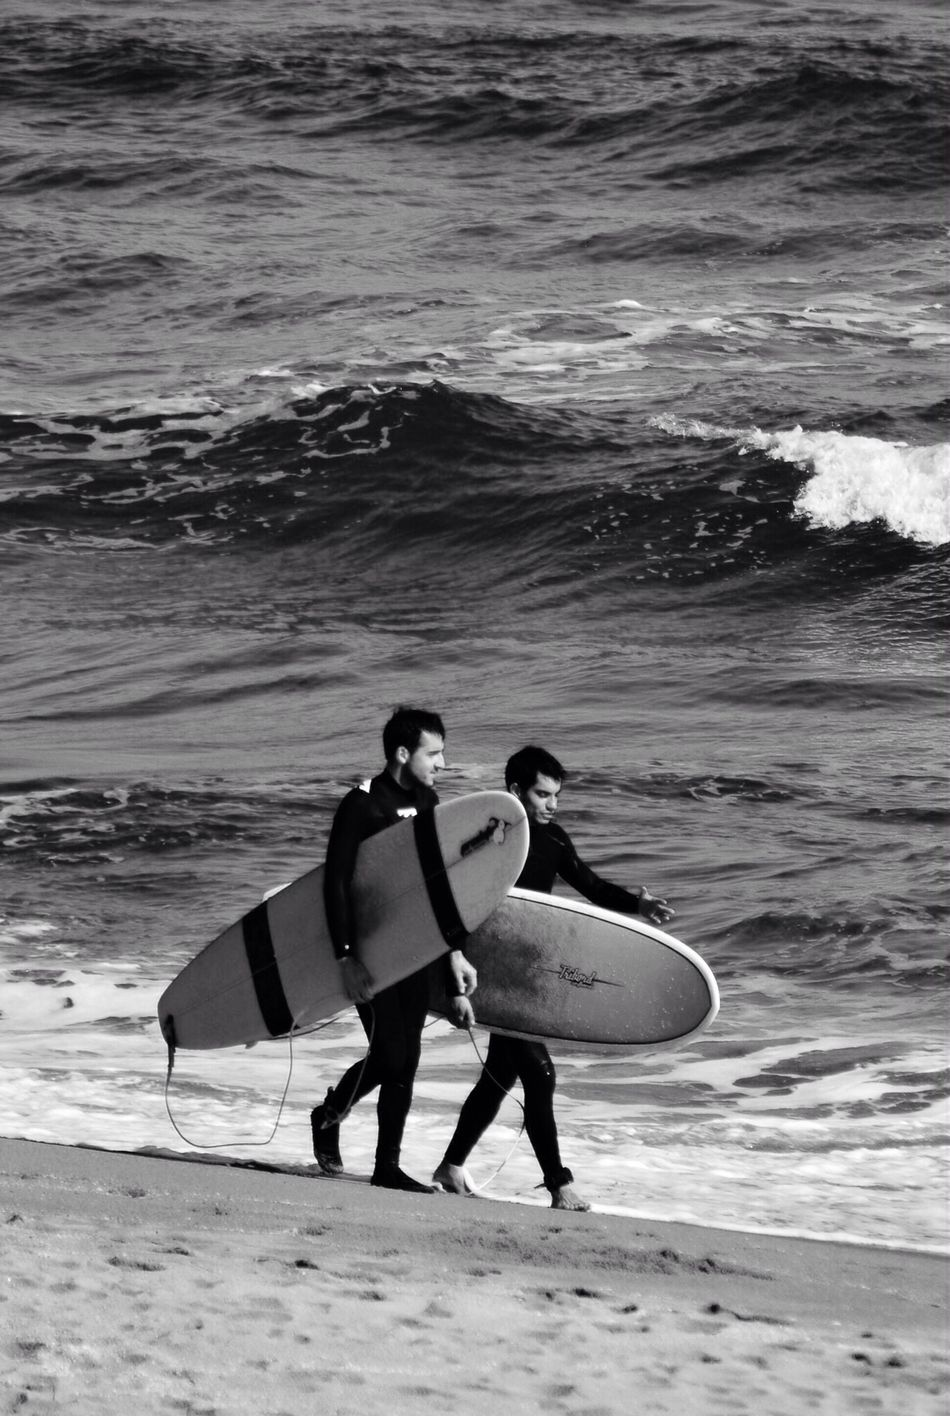 Going Surfing EyeEm Nature Lover